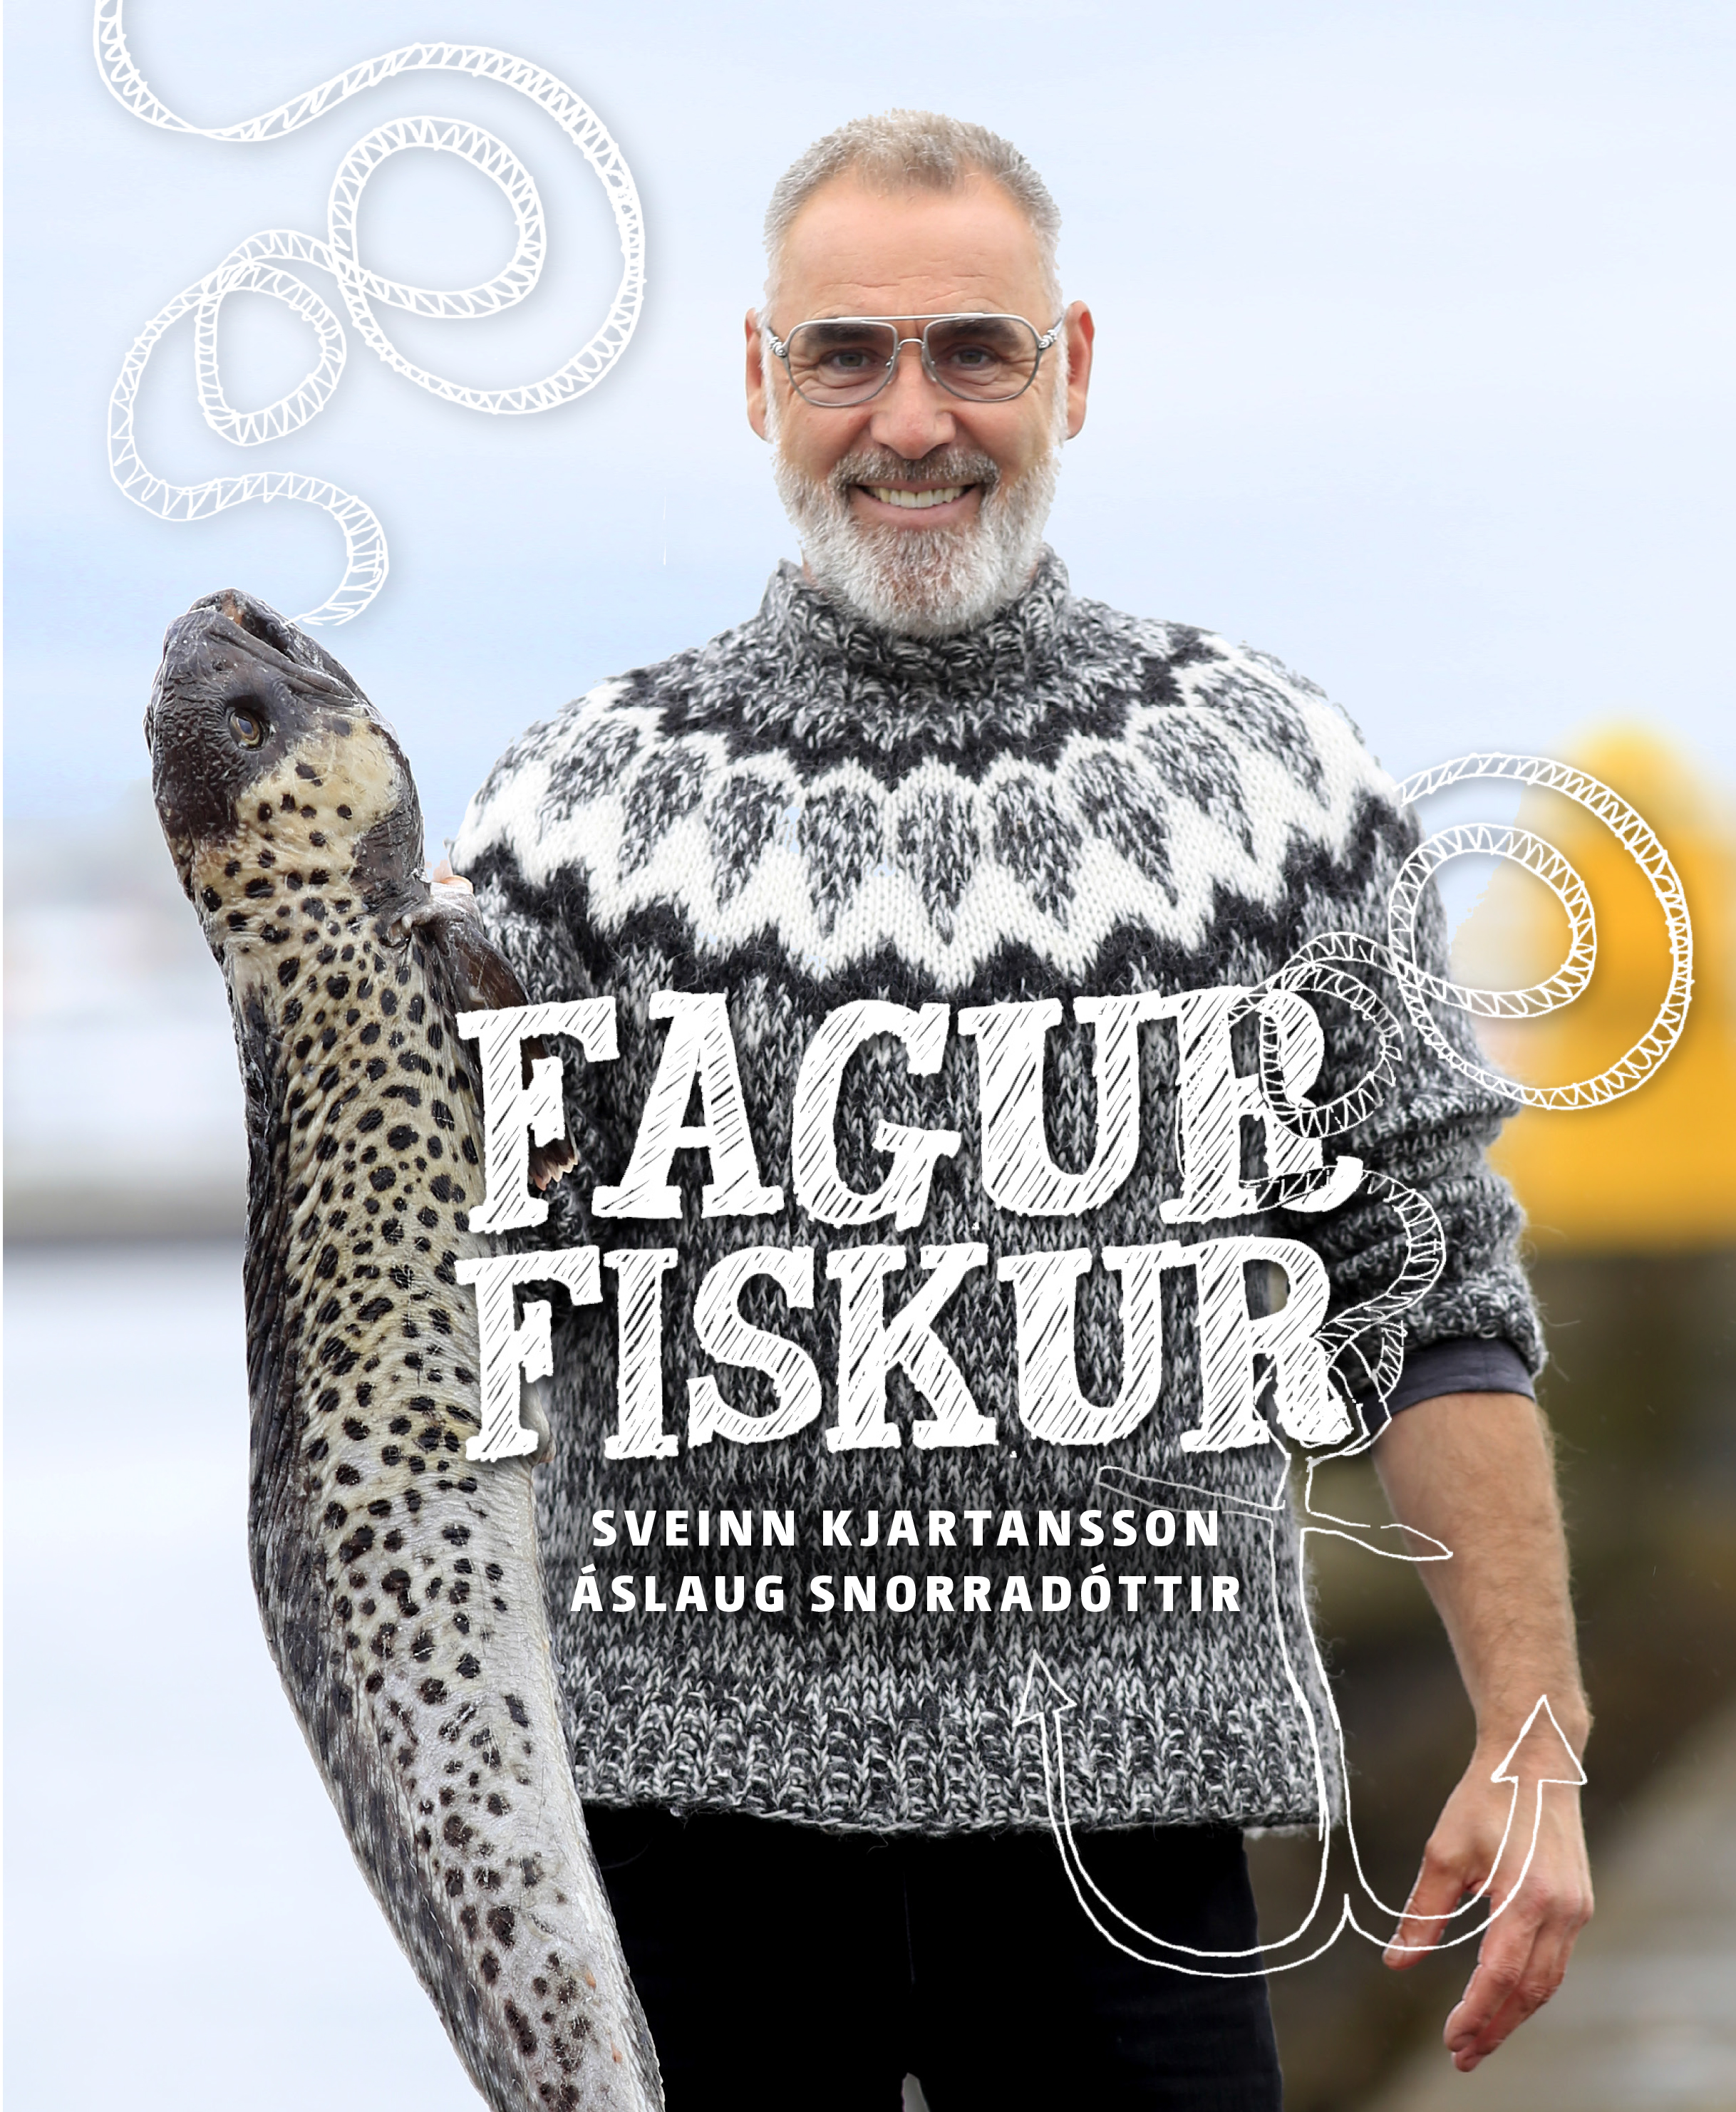 Fagur fiskur